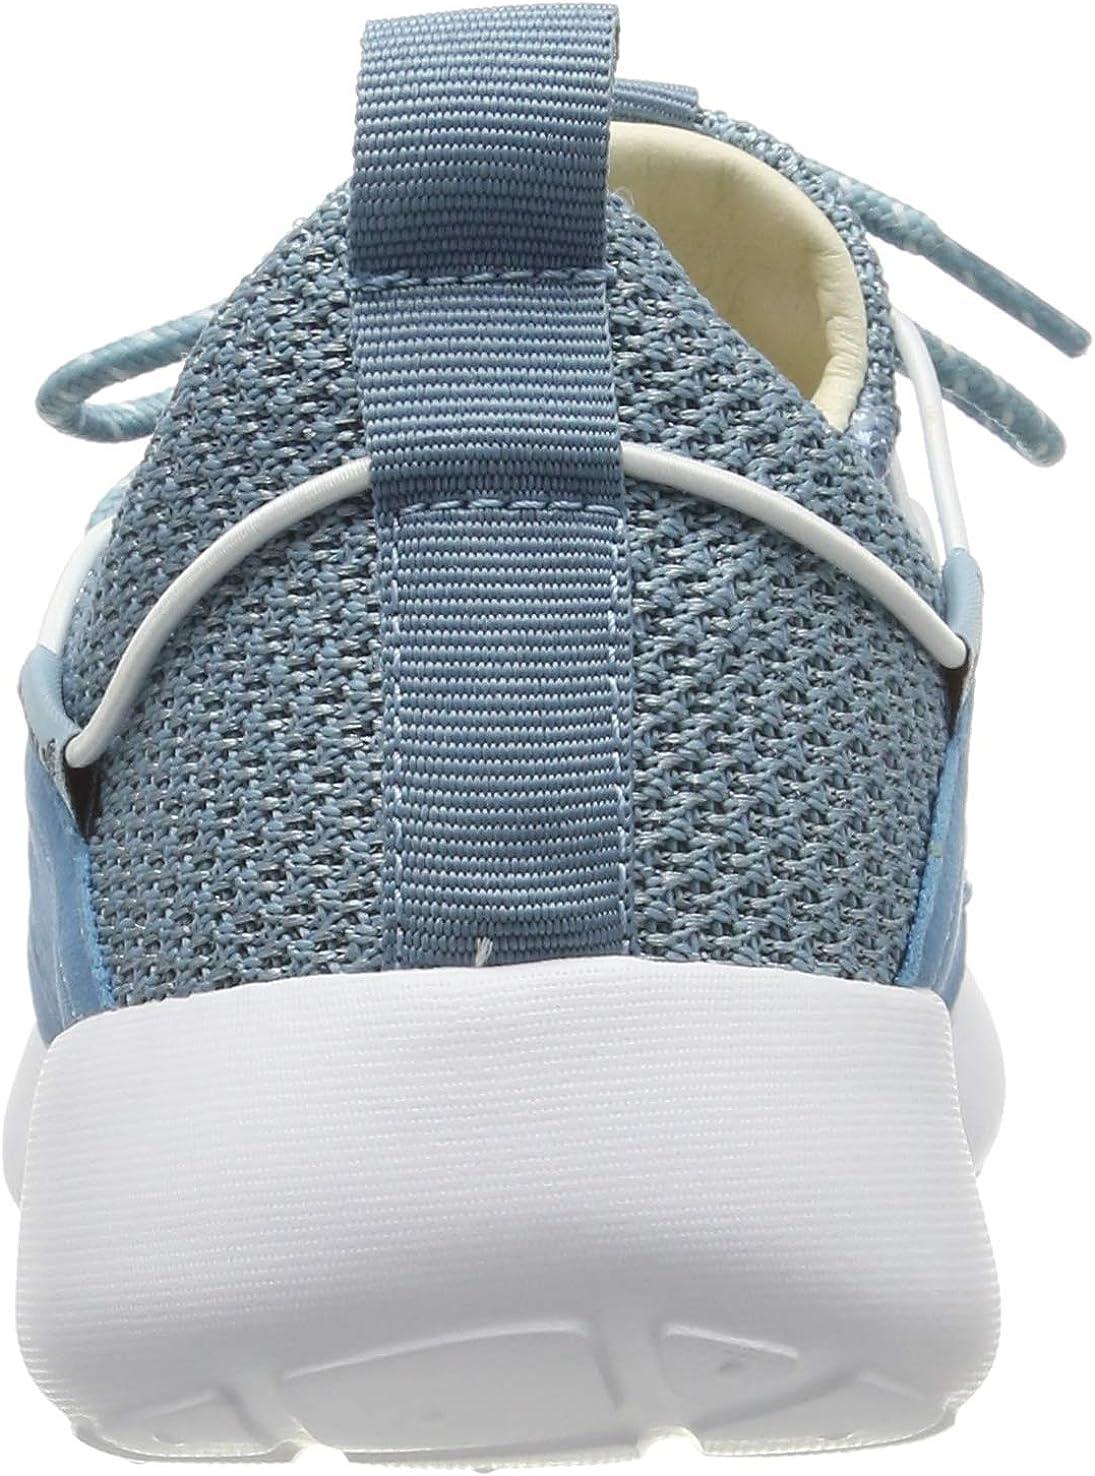 Romika Carry 03, Zapatillas para Mujer Azur Kombi 516